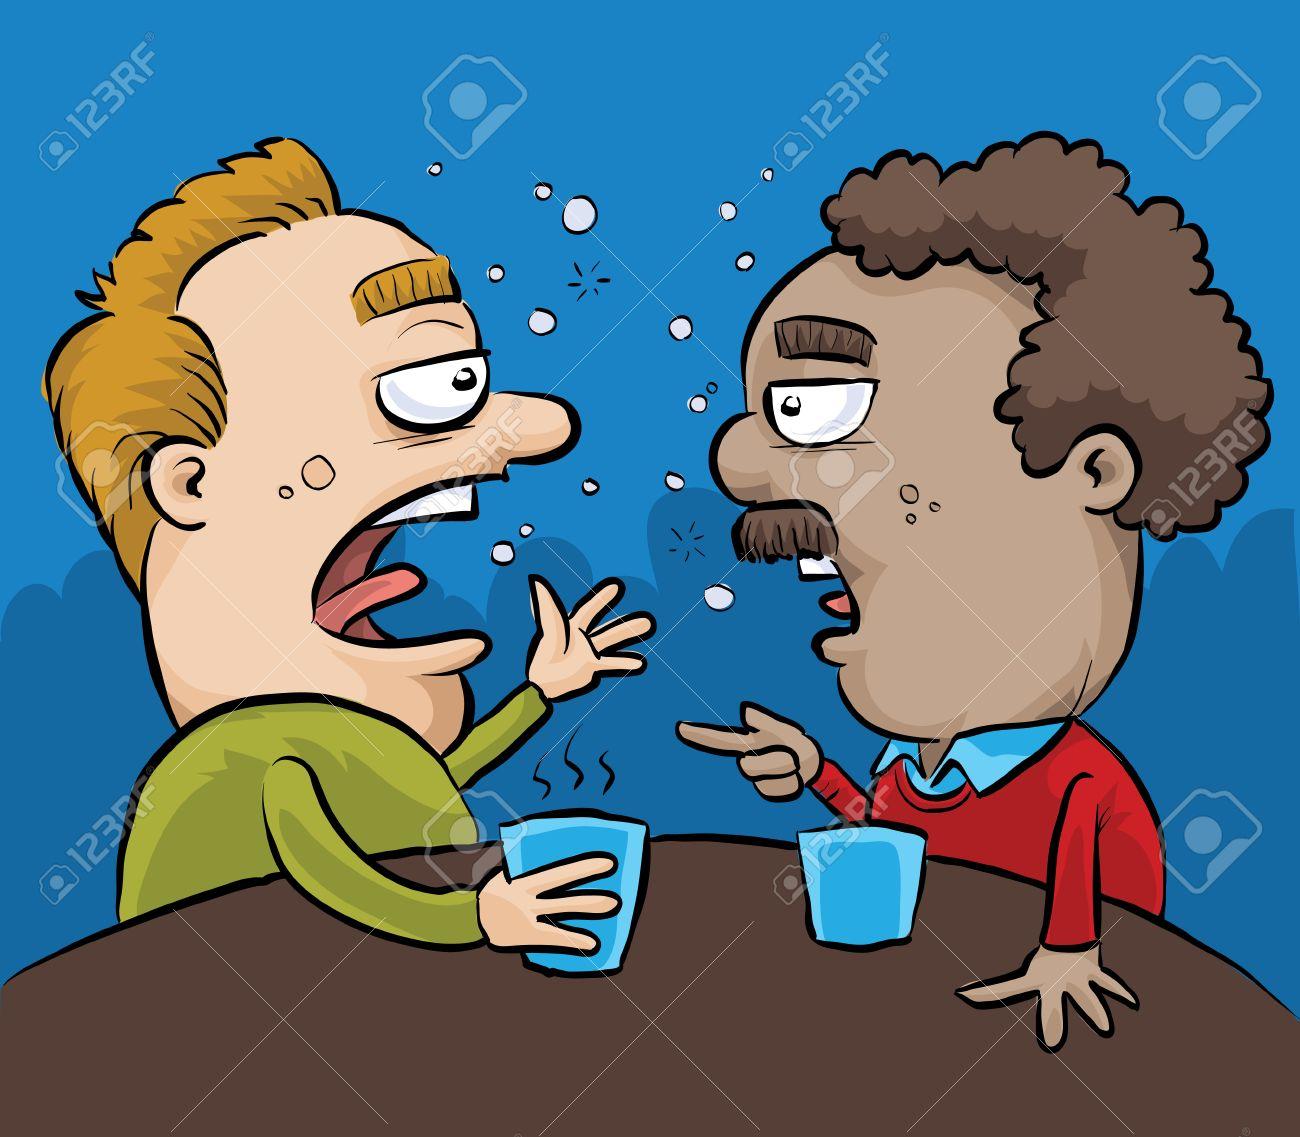 Two drunk cartoon men have a conversation in a pub. - 29636470